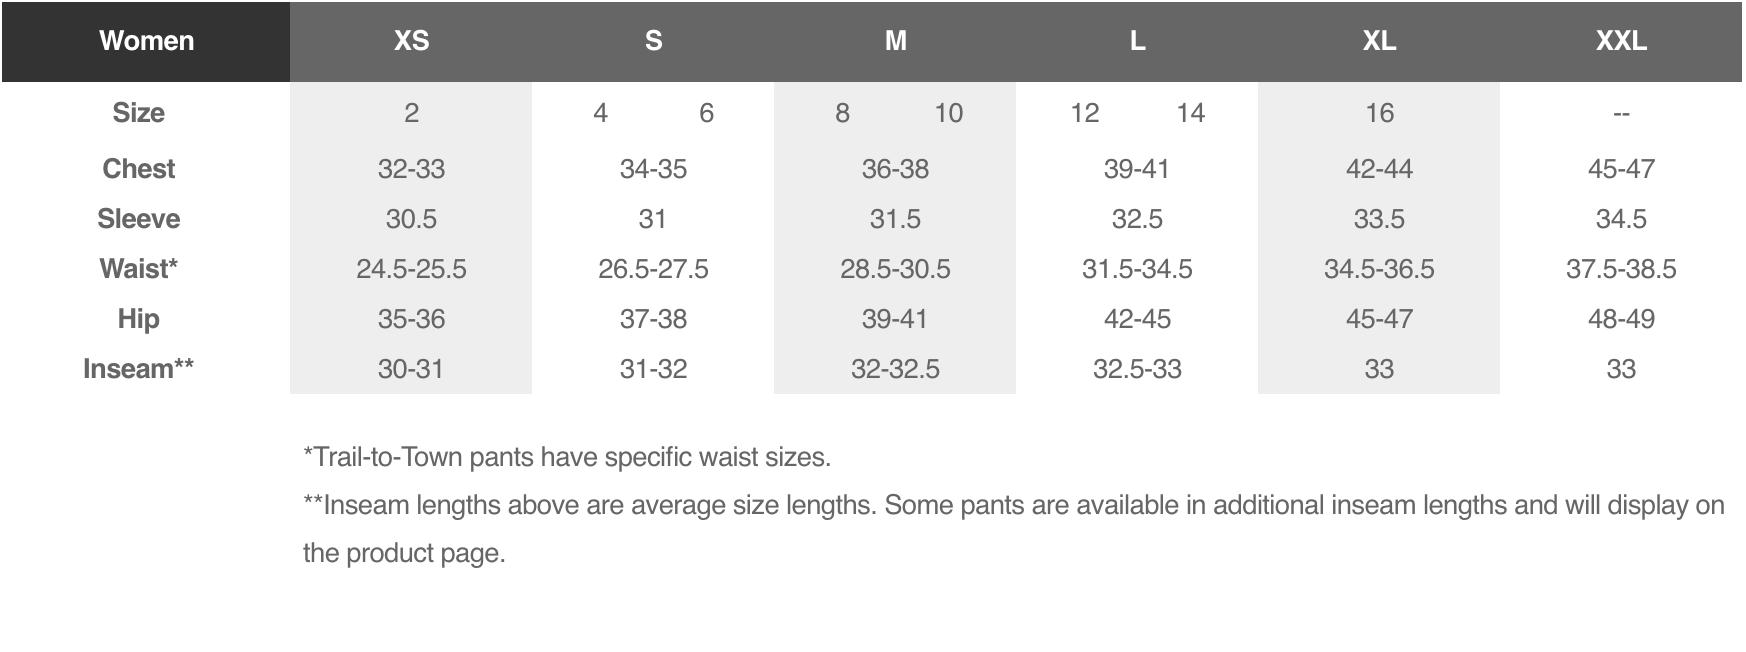 Marmot Women Sizes